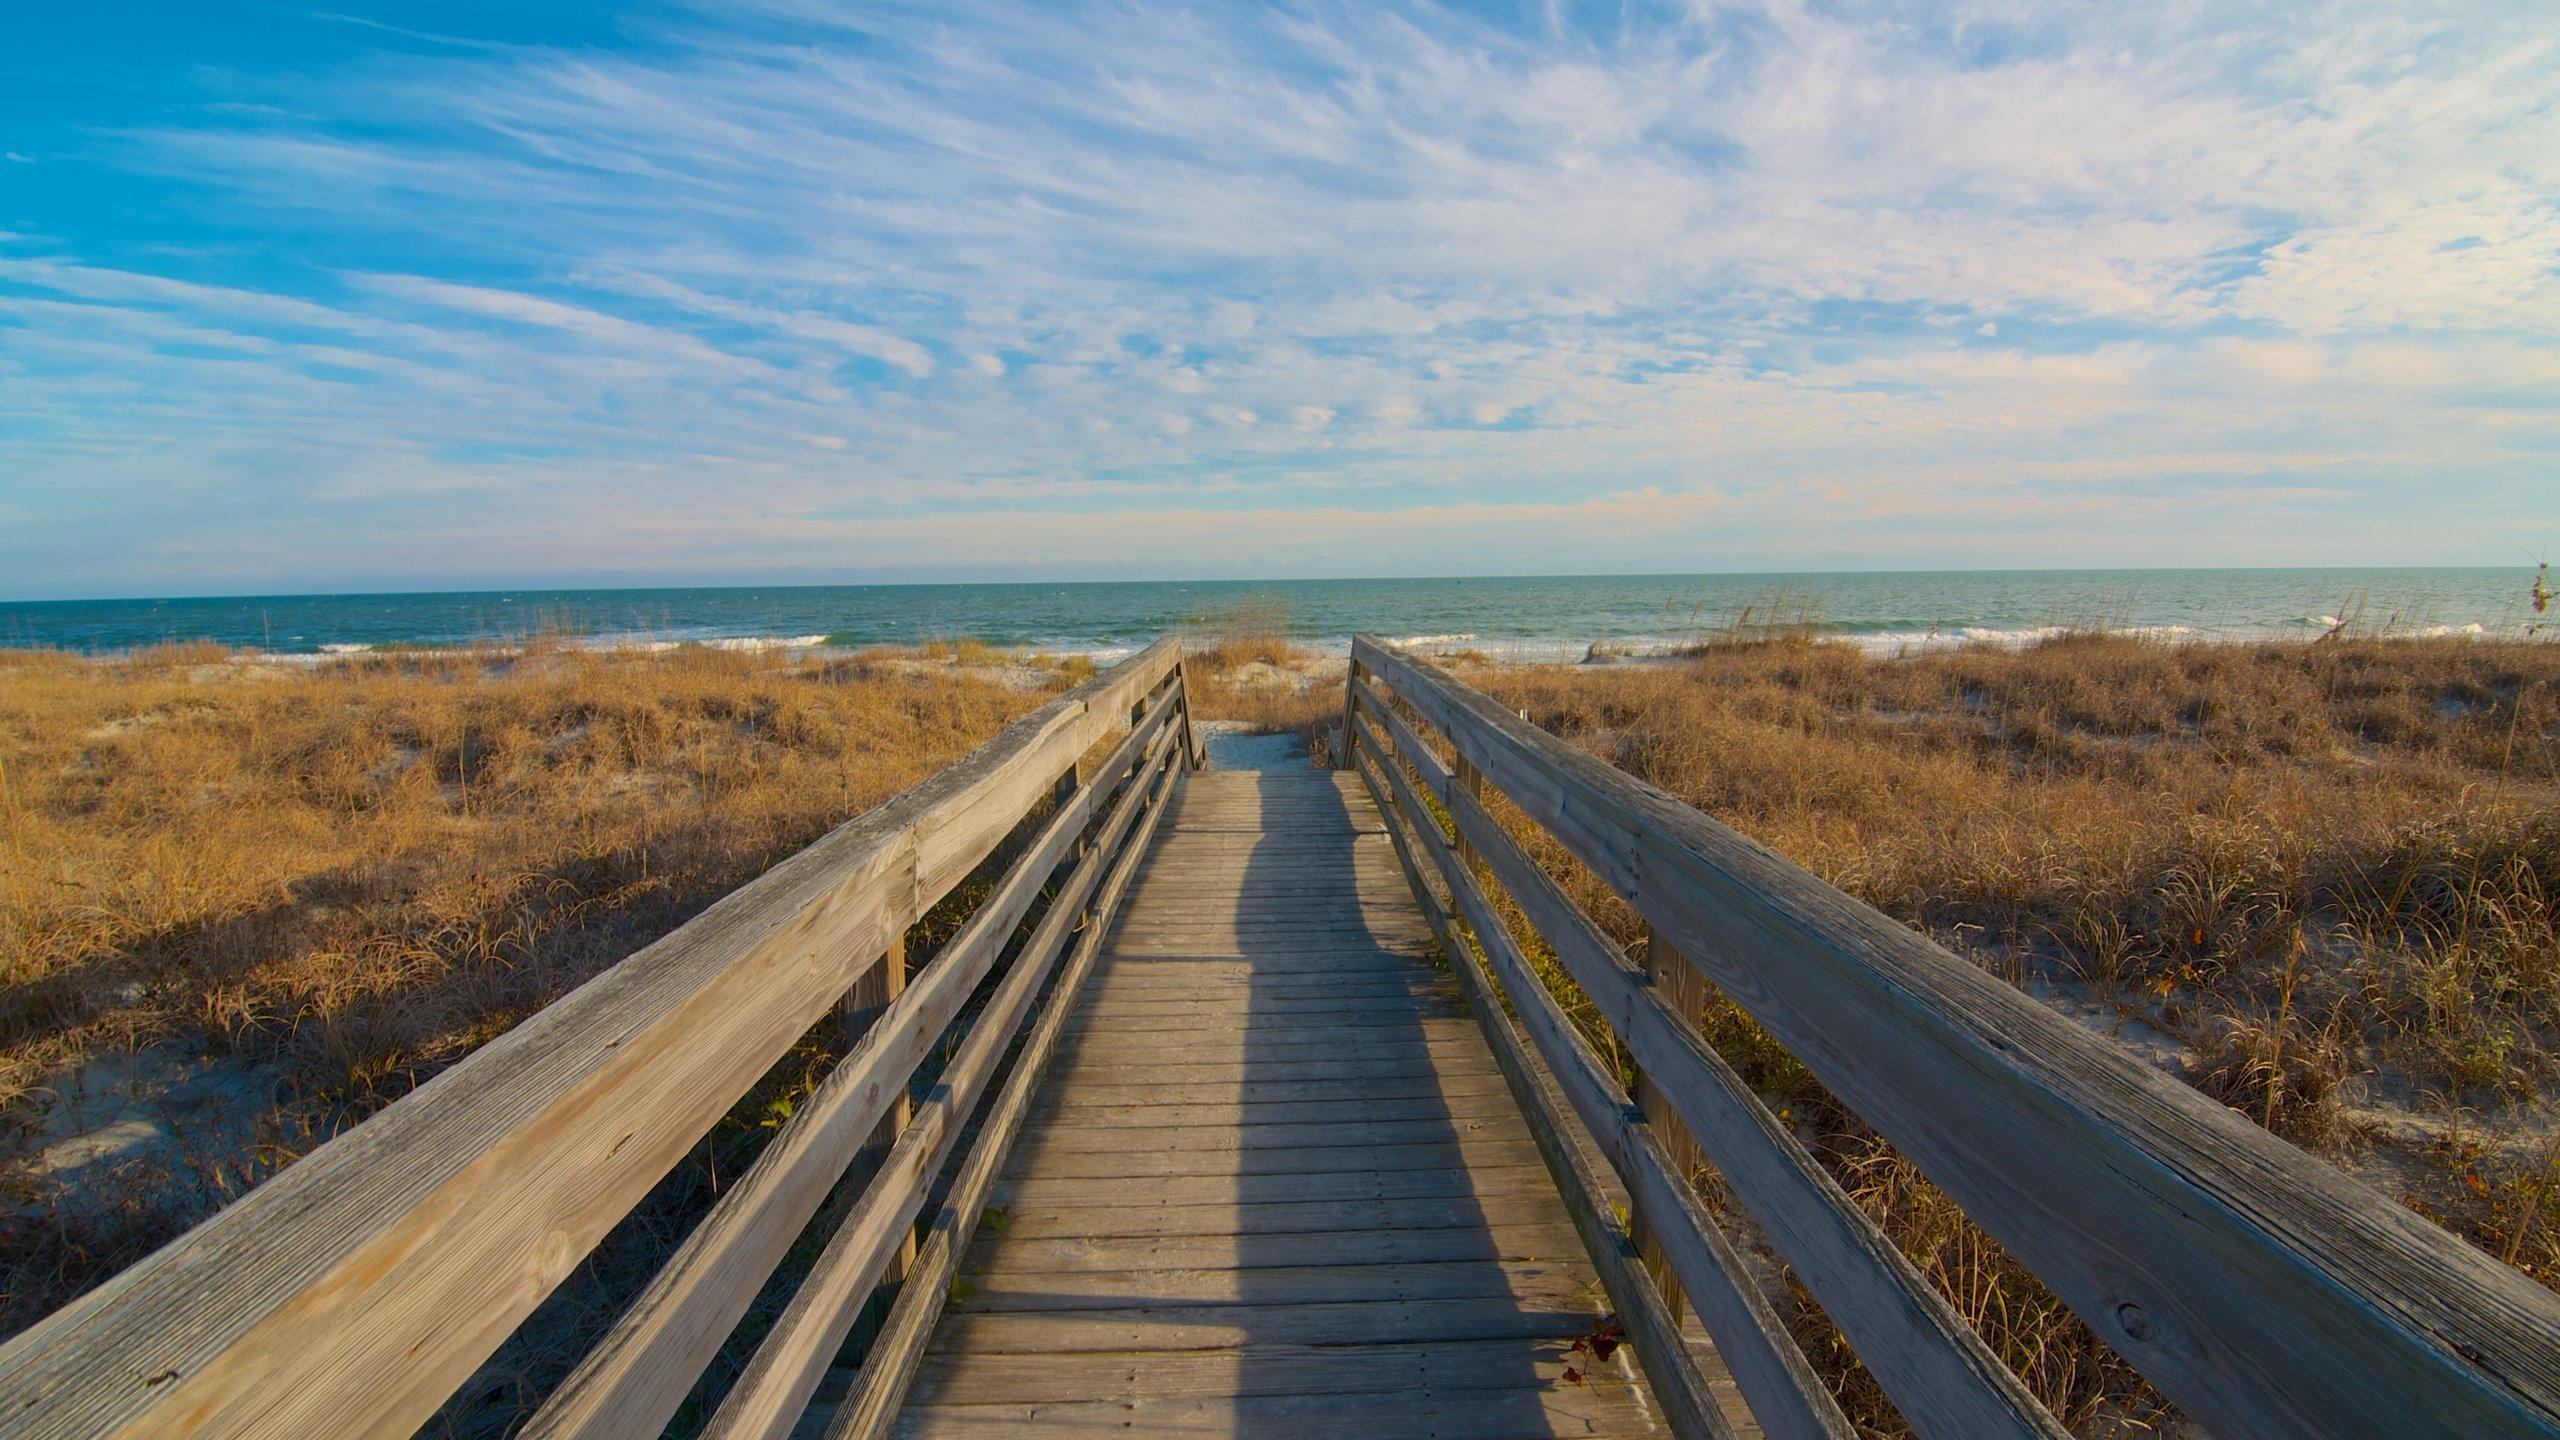 Garden City Beach, South Carolina, USA